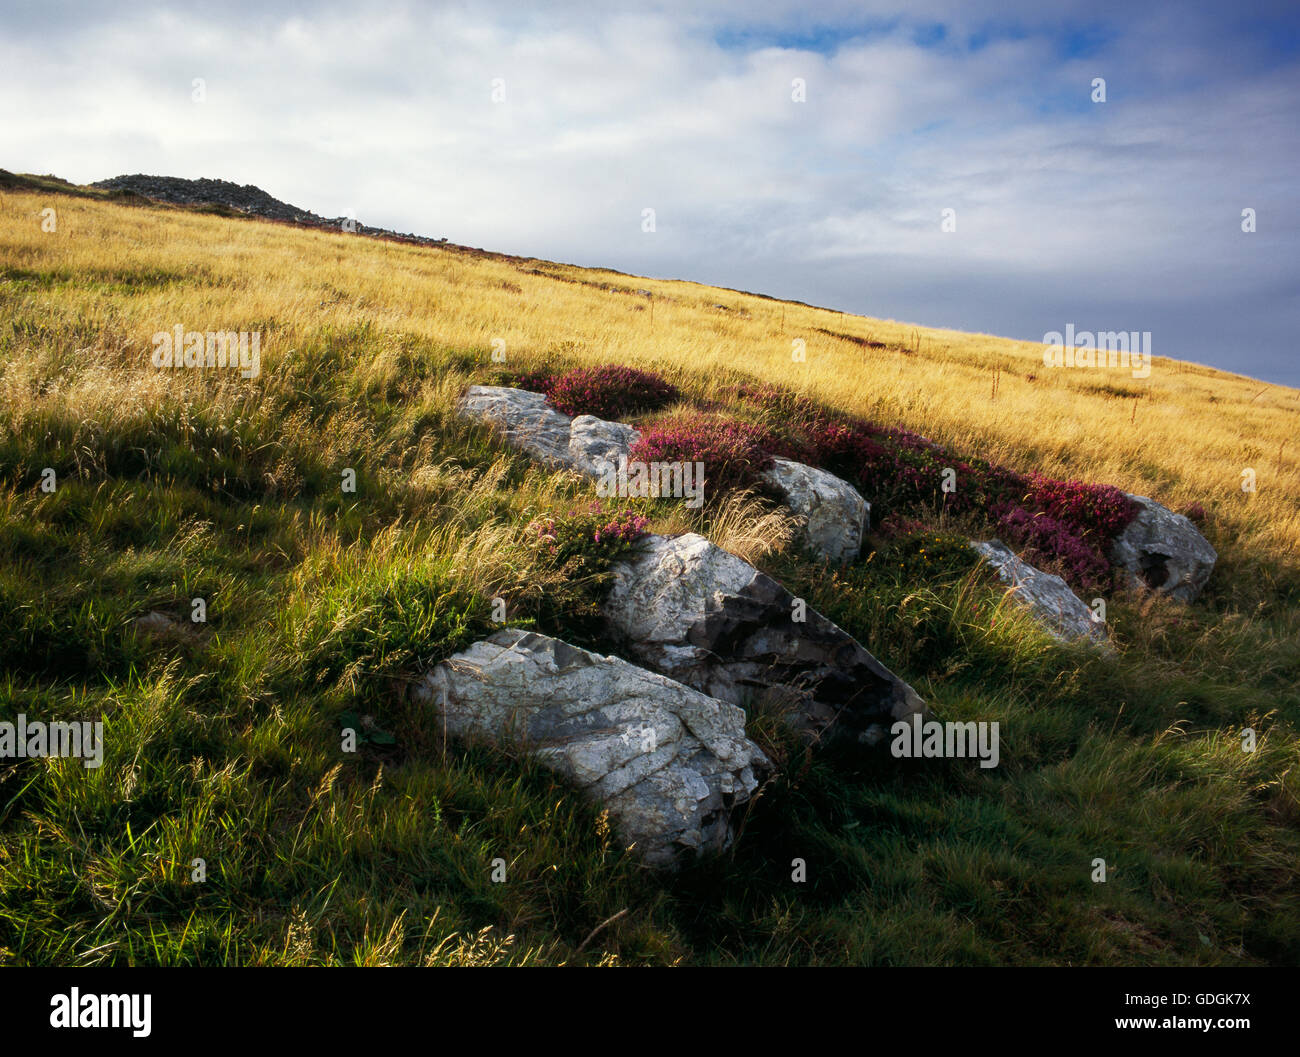 Mynydd Rhiw Neolithic axe factory, Llyn, Gwynedd: an outcrop of fine-grained flinty-textured volcanically-baked - Stock Image